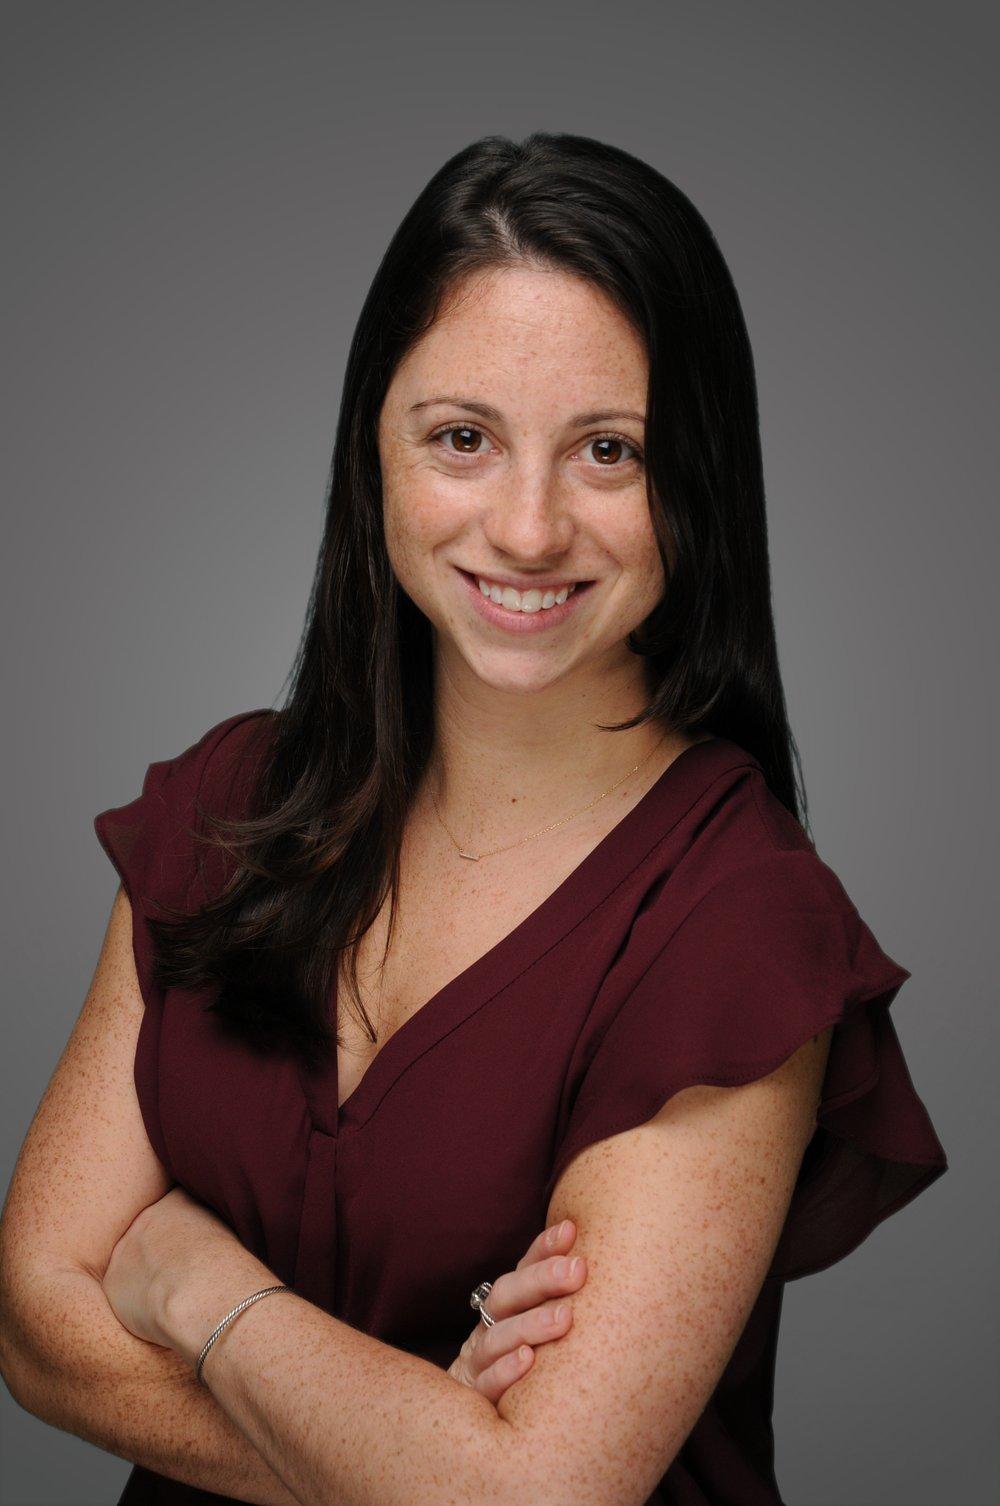 Rachel Serwetz   Conference Committee  rs4116@stern.nyu.edu